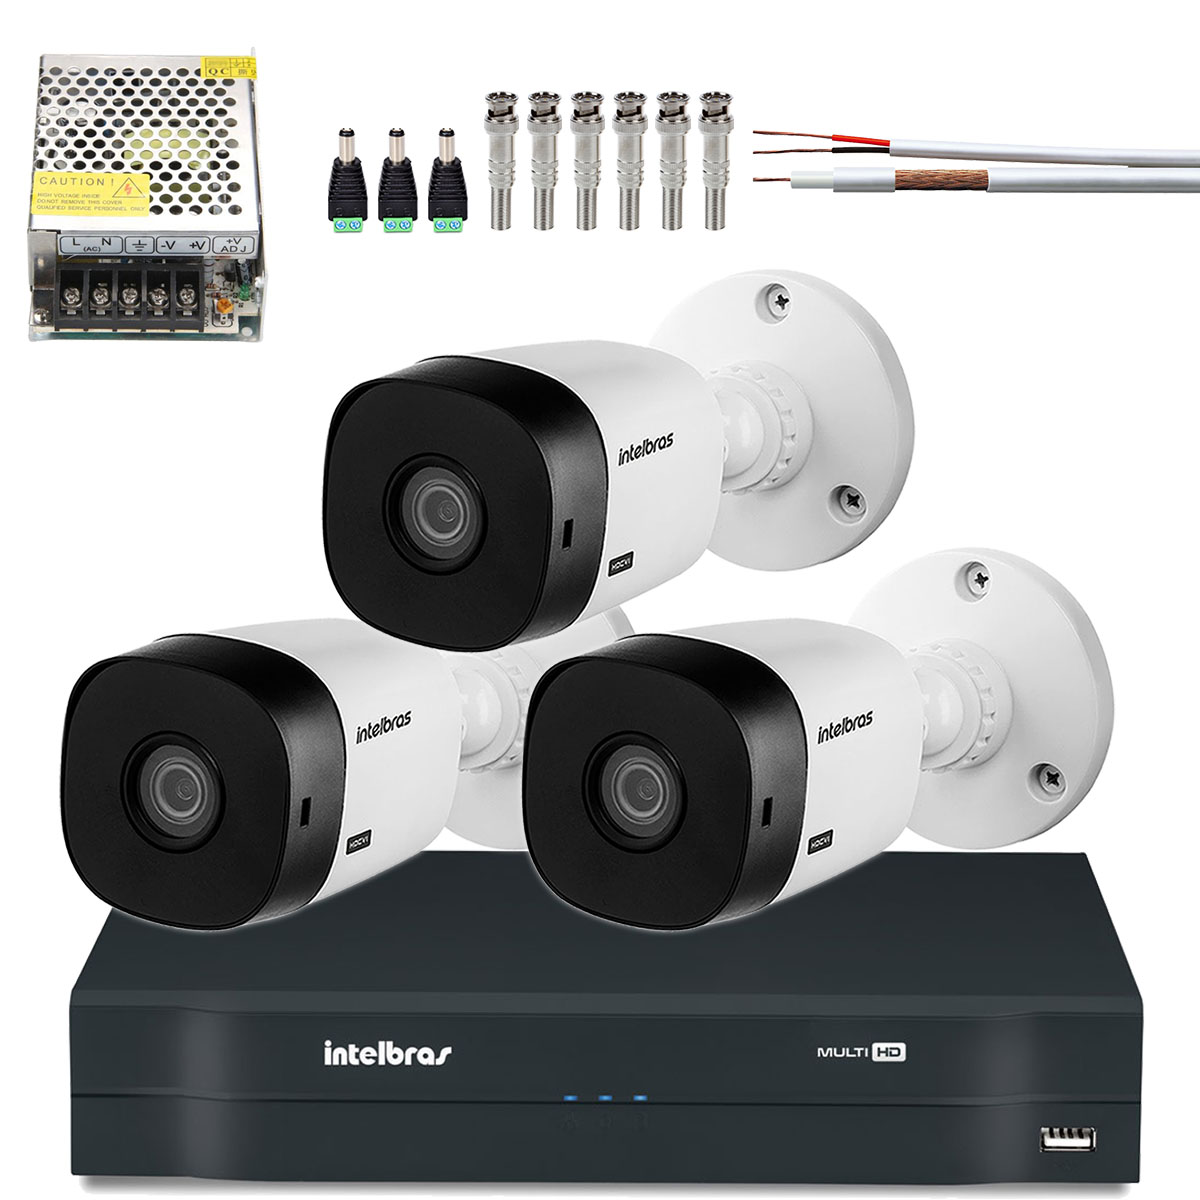 Kit 3 Cameras Intelbras Multi Hd 720p Vhd 1010b Lente 3.6mm